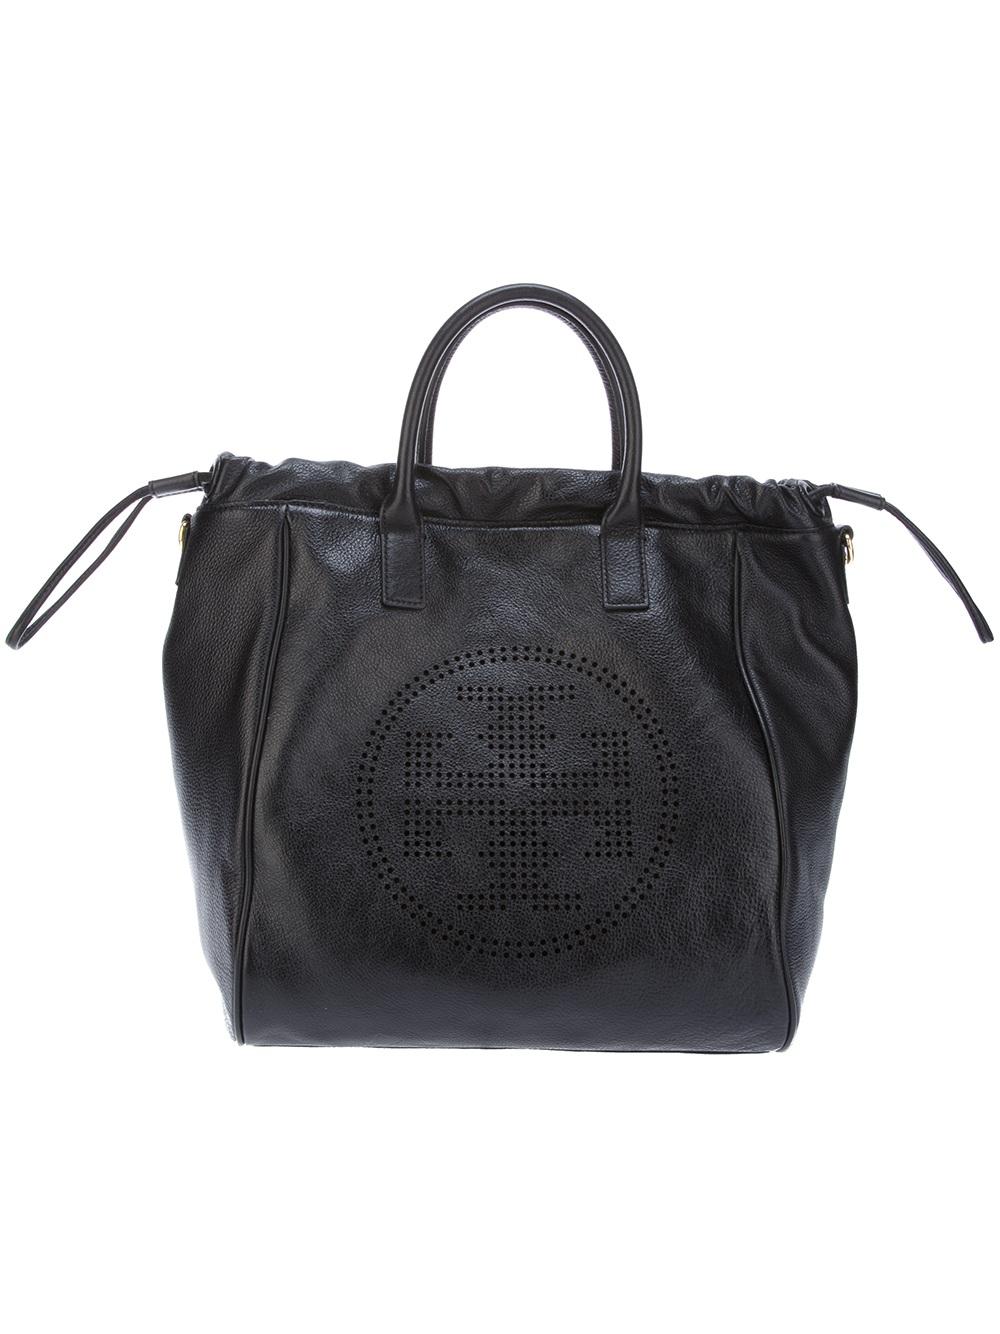 2556f8dc0867 Tory Burch Drawstring Tote Bag in Black - Lyst